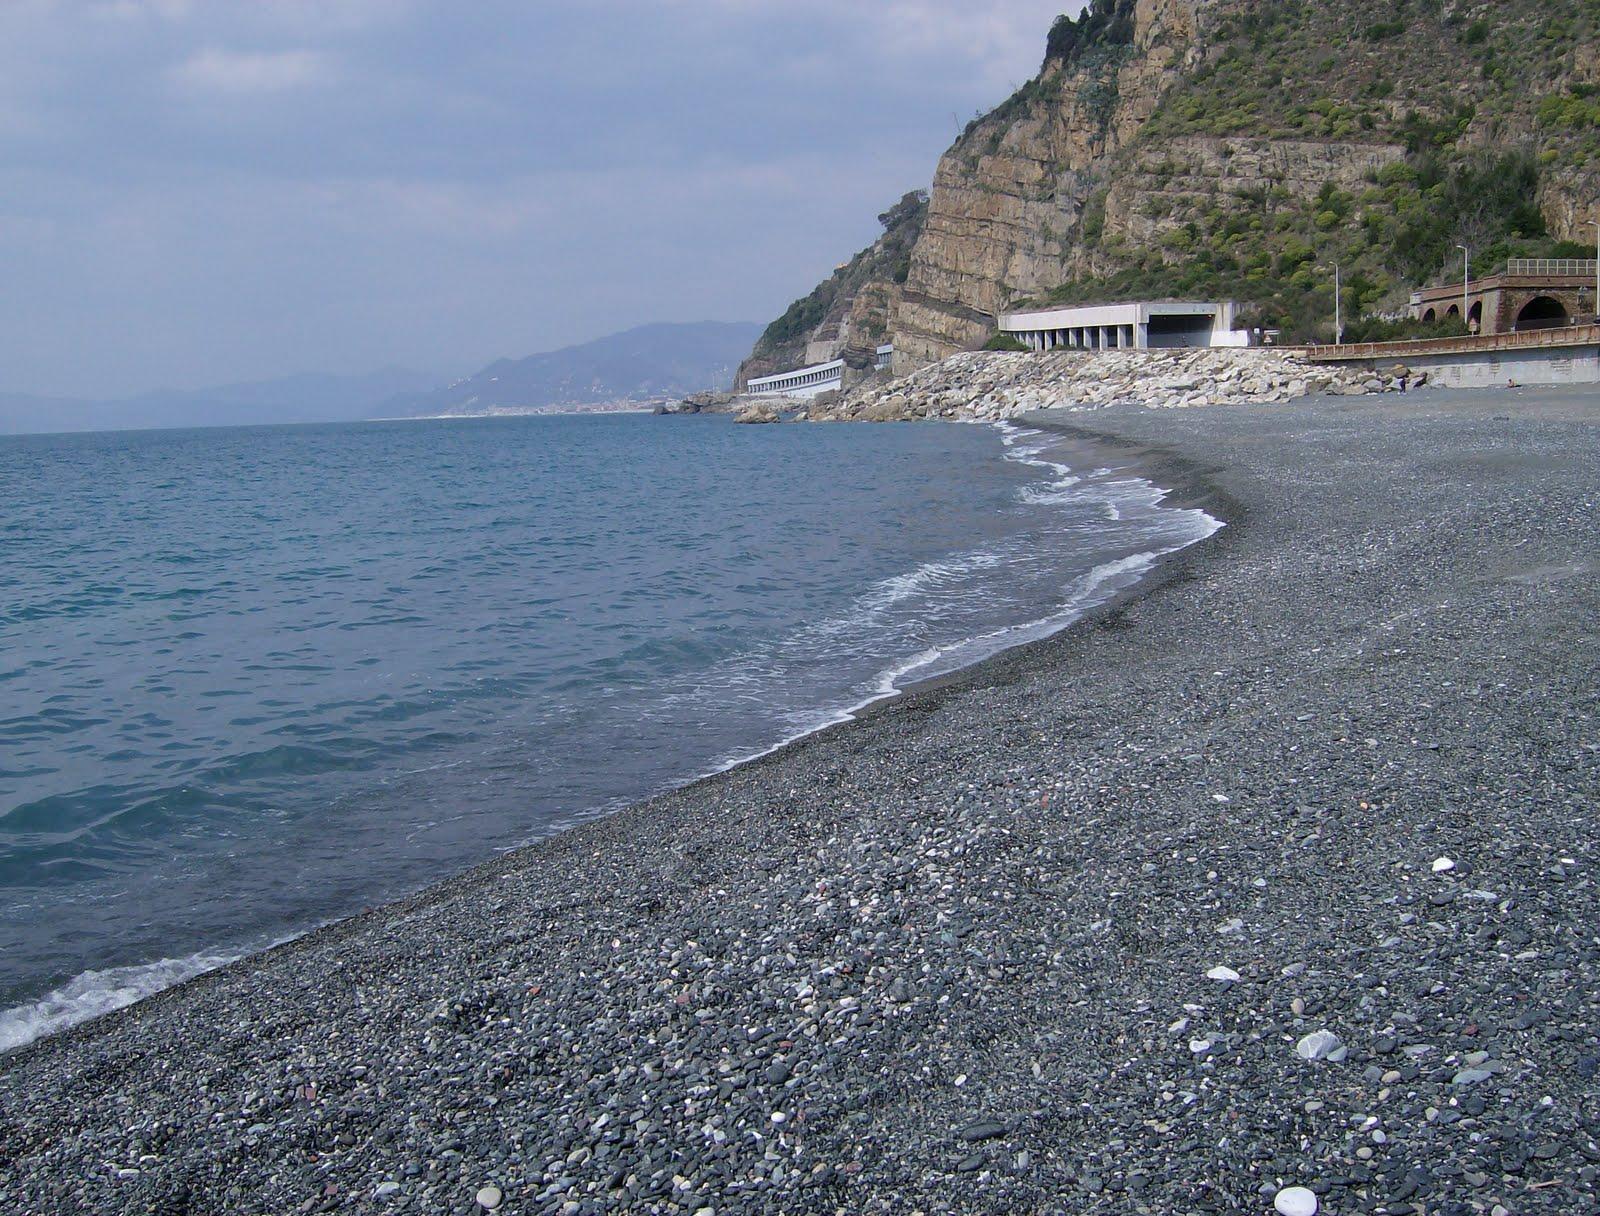 Matrimonio Spiaggia Sestri Levante : Sant annabeach spiagga a sestri levante